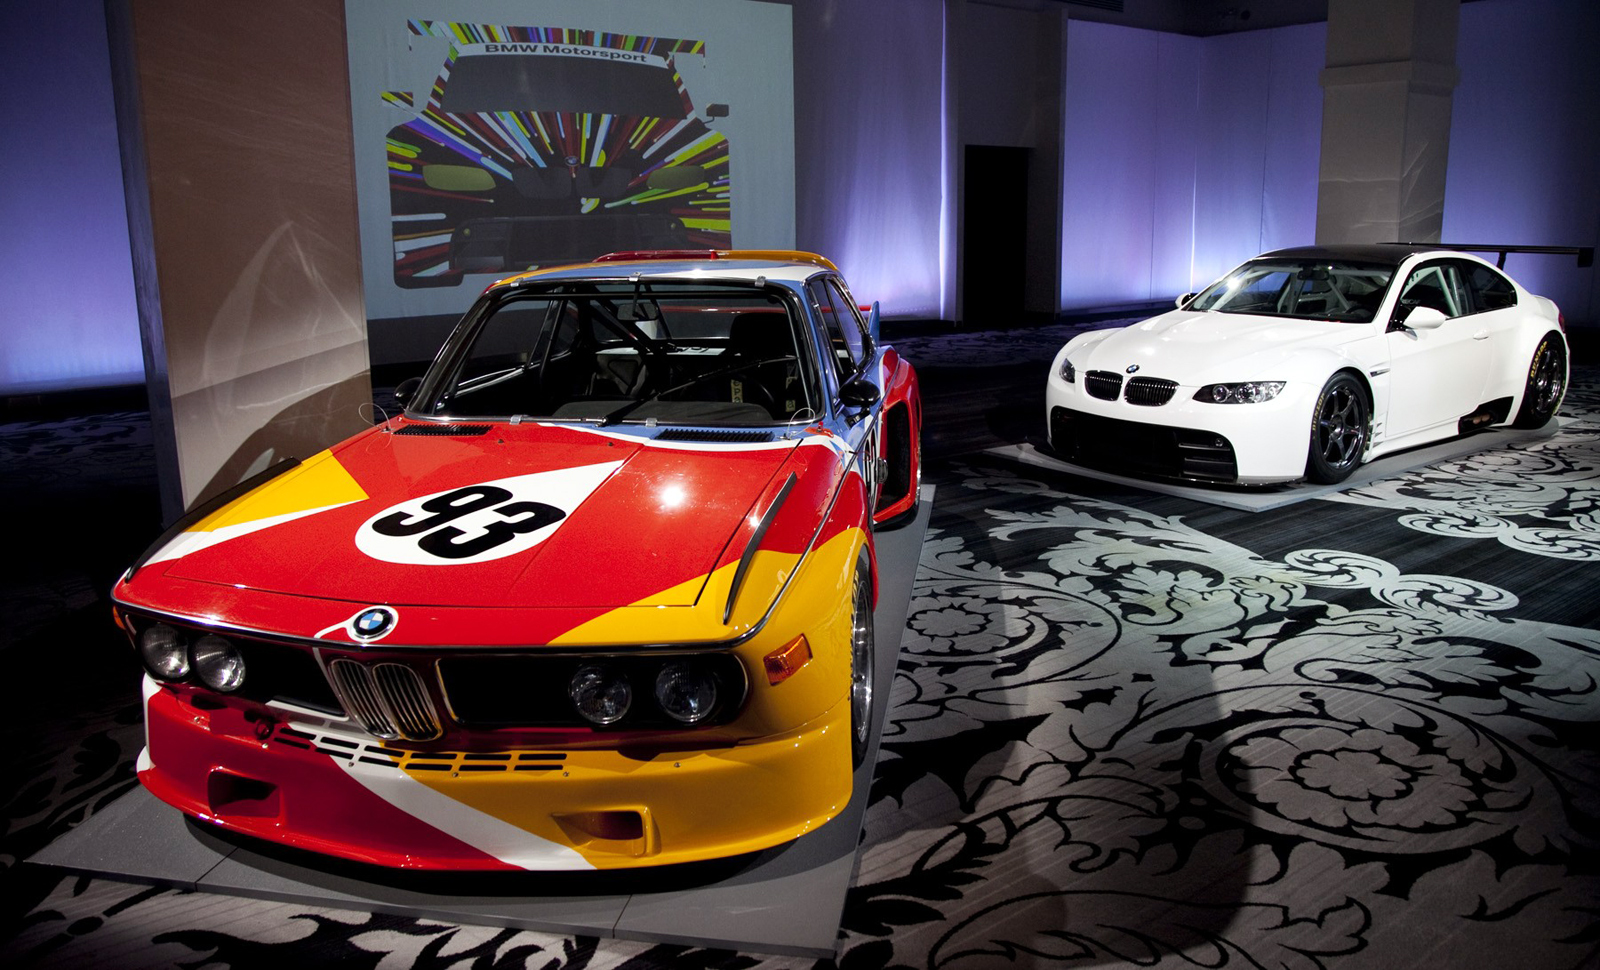 Image [ 30 of 49 ] - Art Cars Part of Bmw M3 Gt2 Art Car 2 - New HD ...